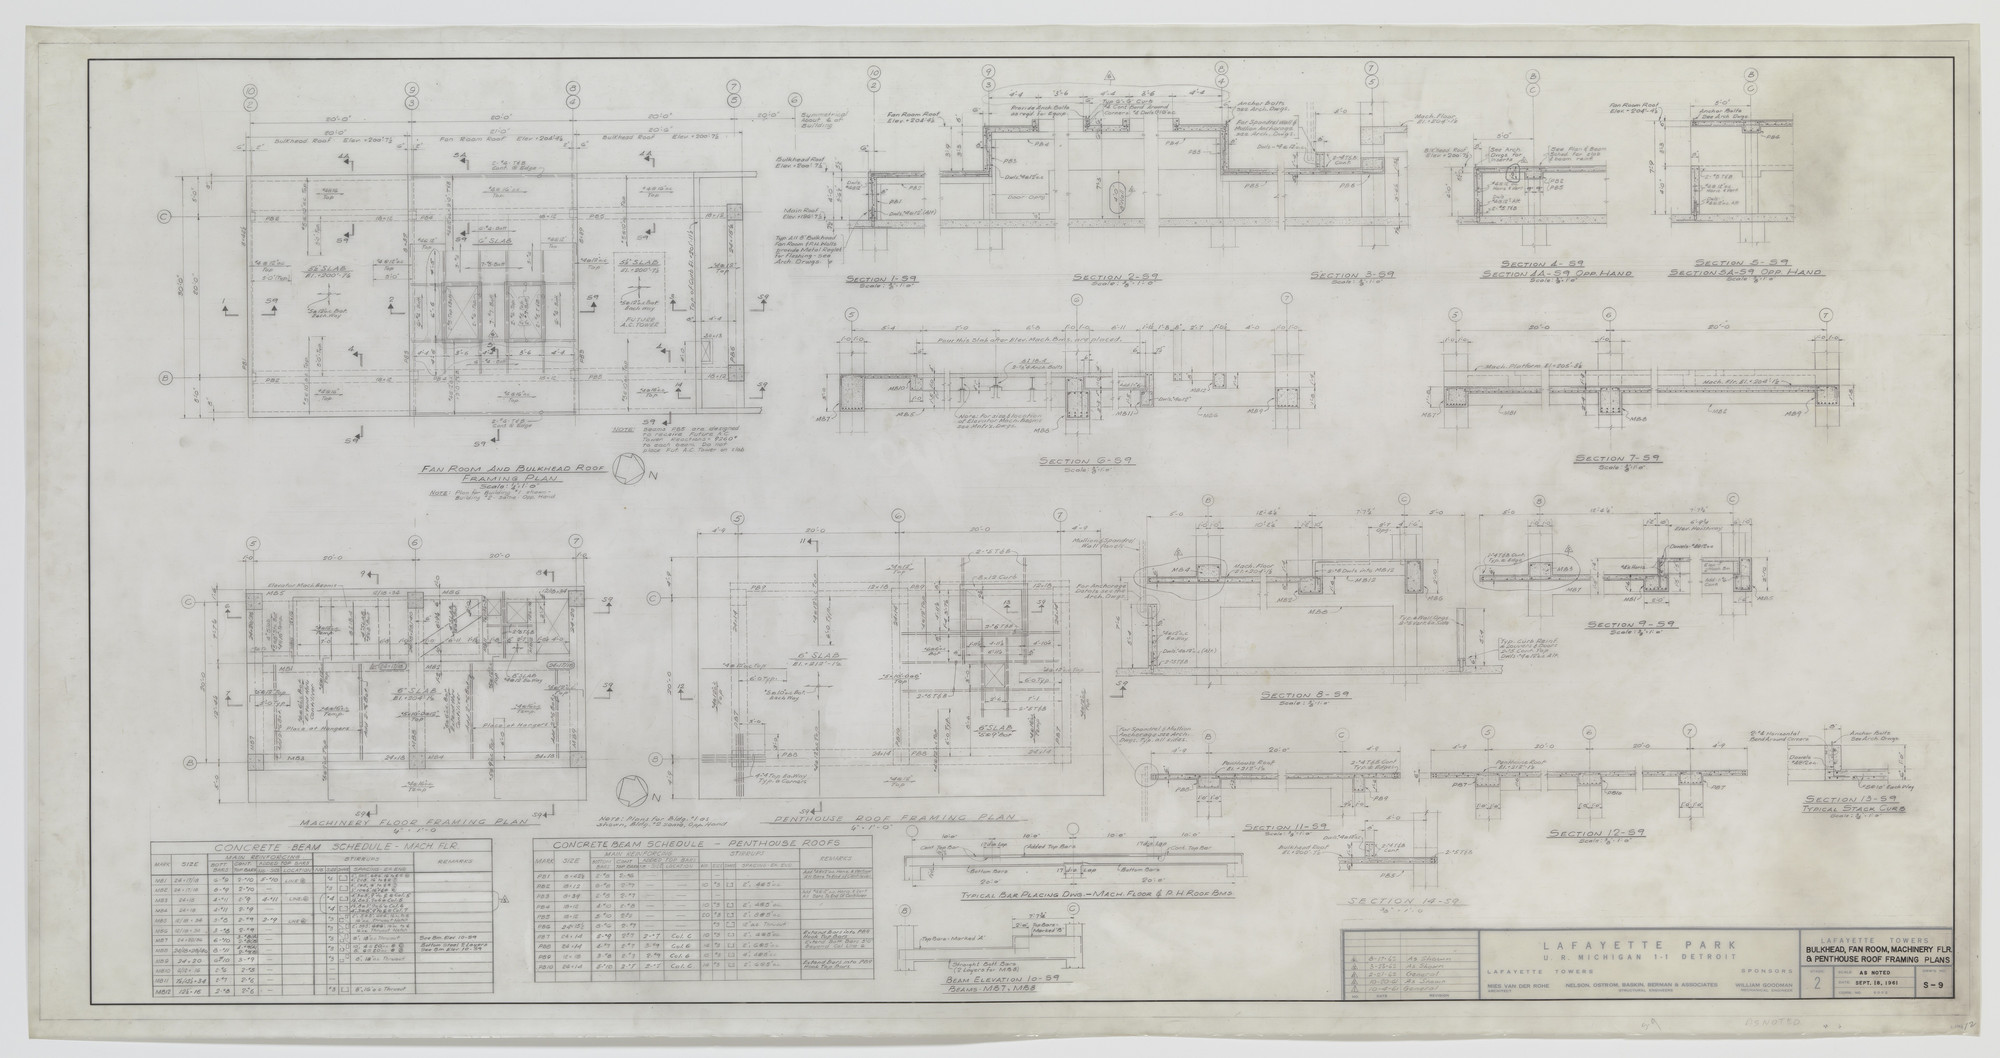 Ludwig Mies van der Rohe. Lafayette Towers, Detroit, MI. 1960 | MoMA